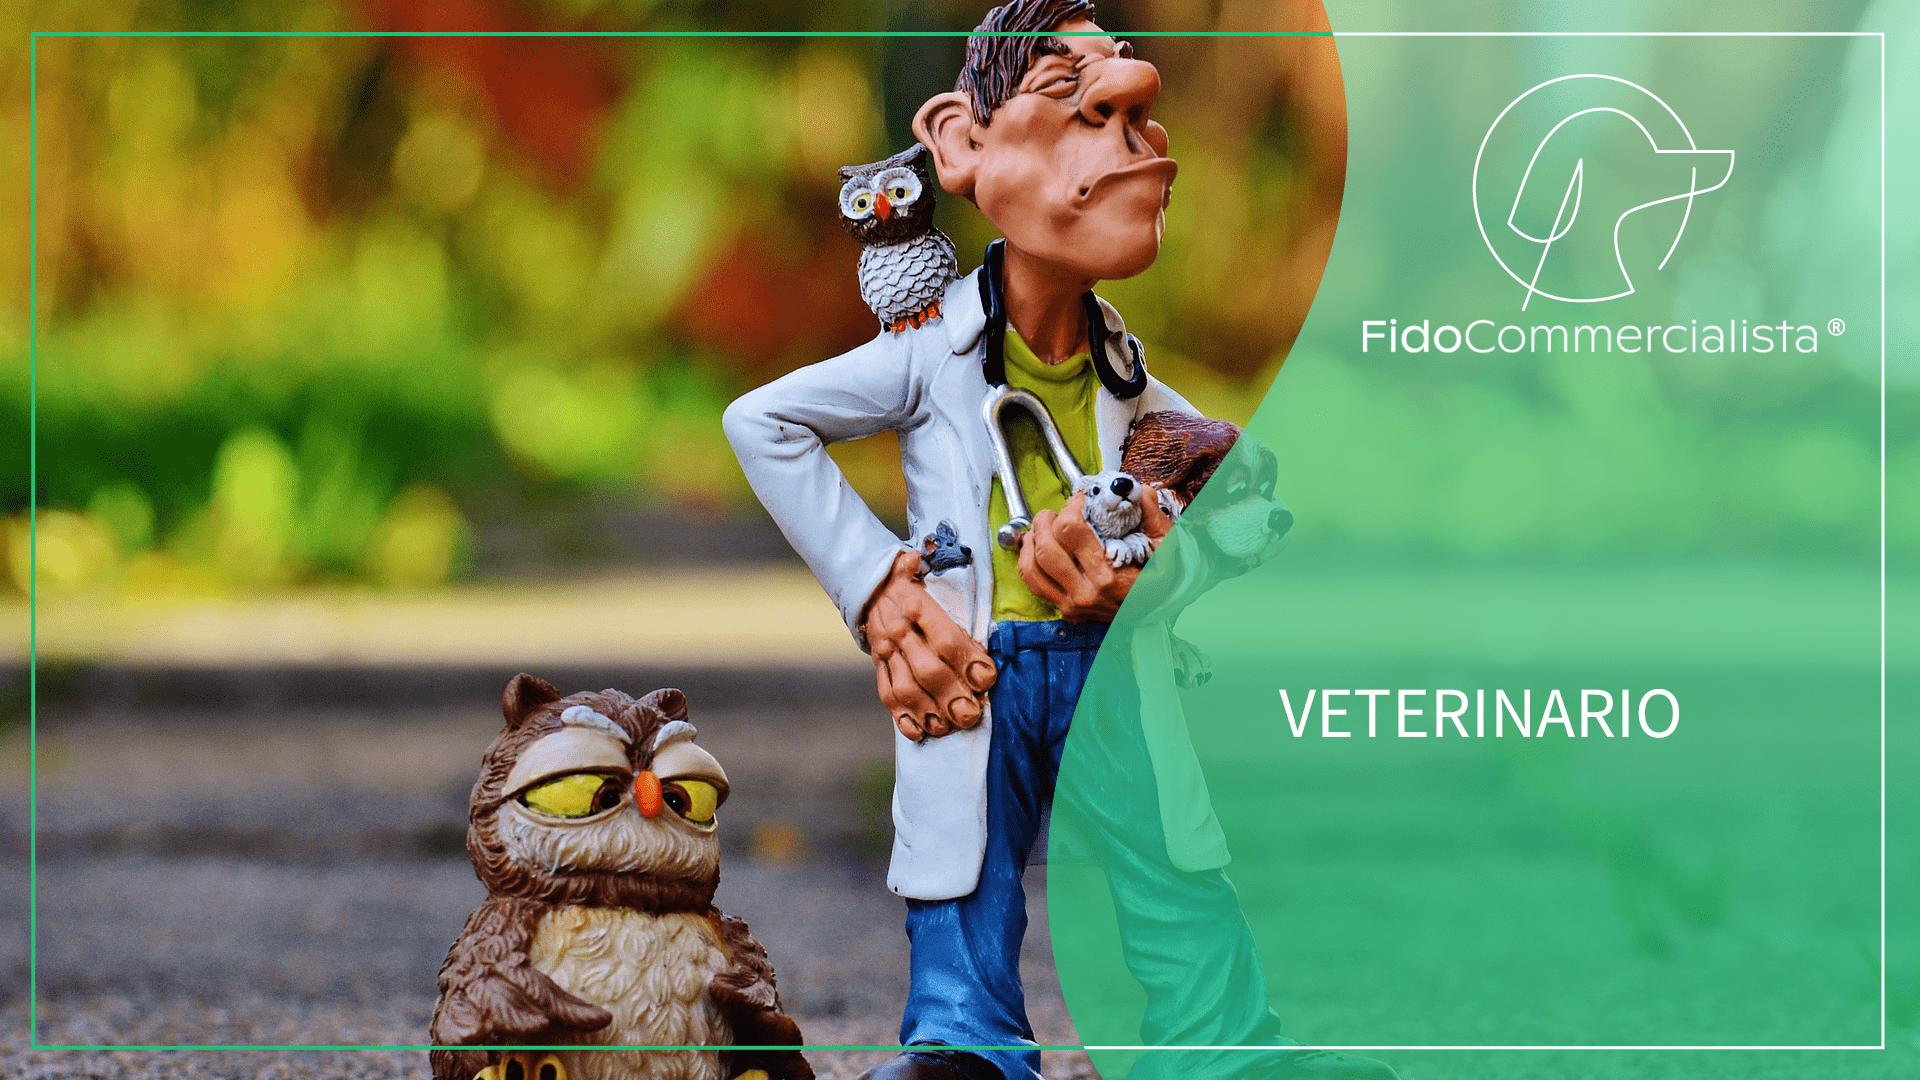 veterinarian-1050805_1920 (1)